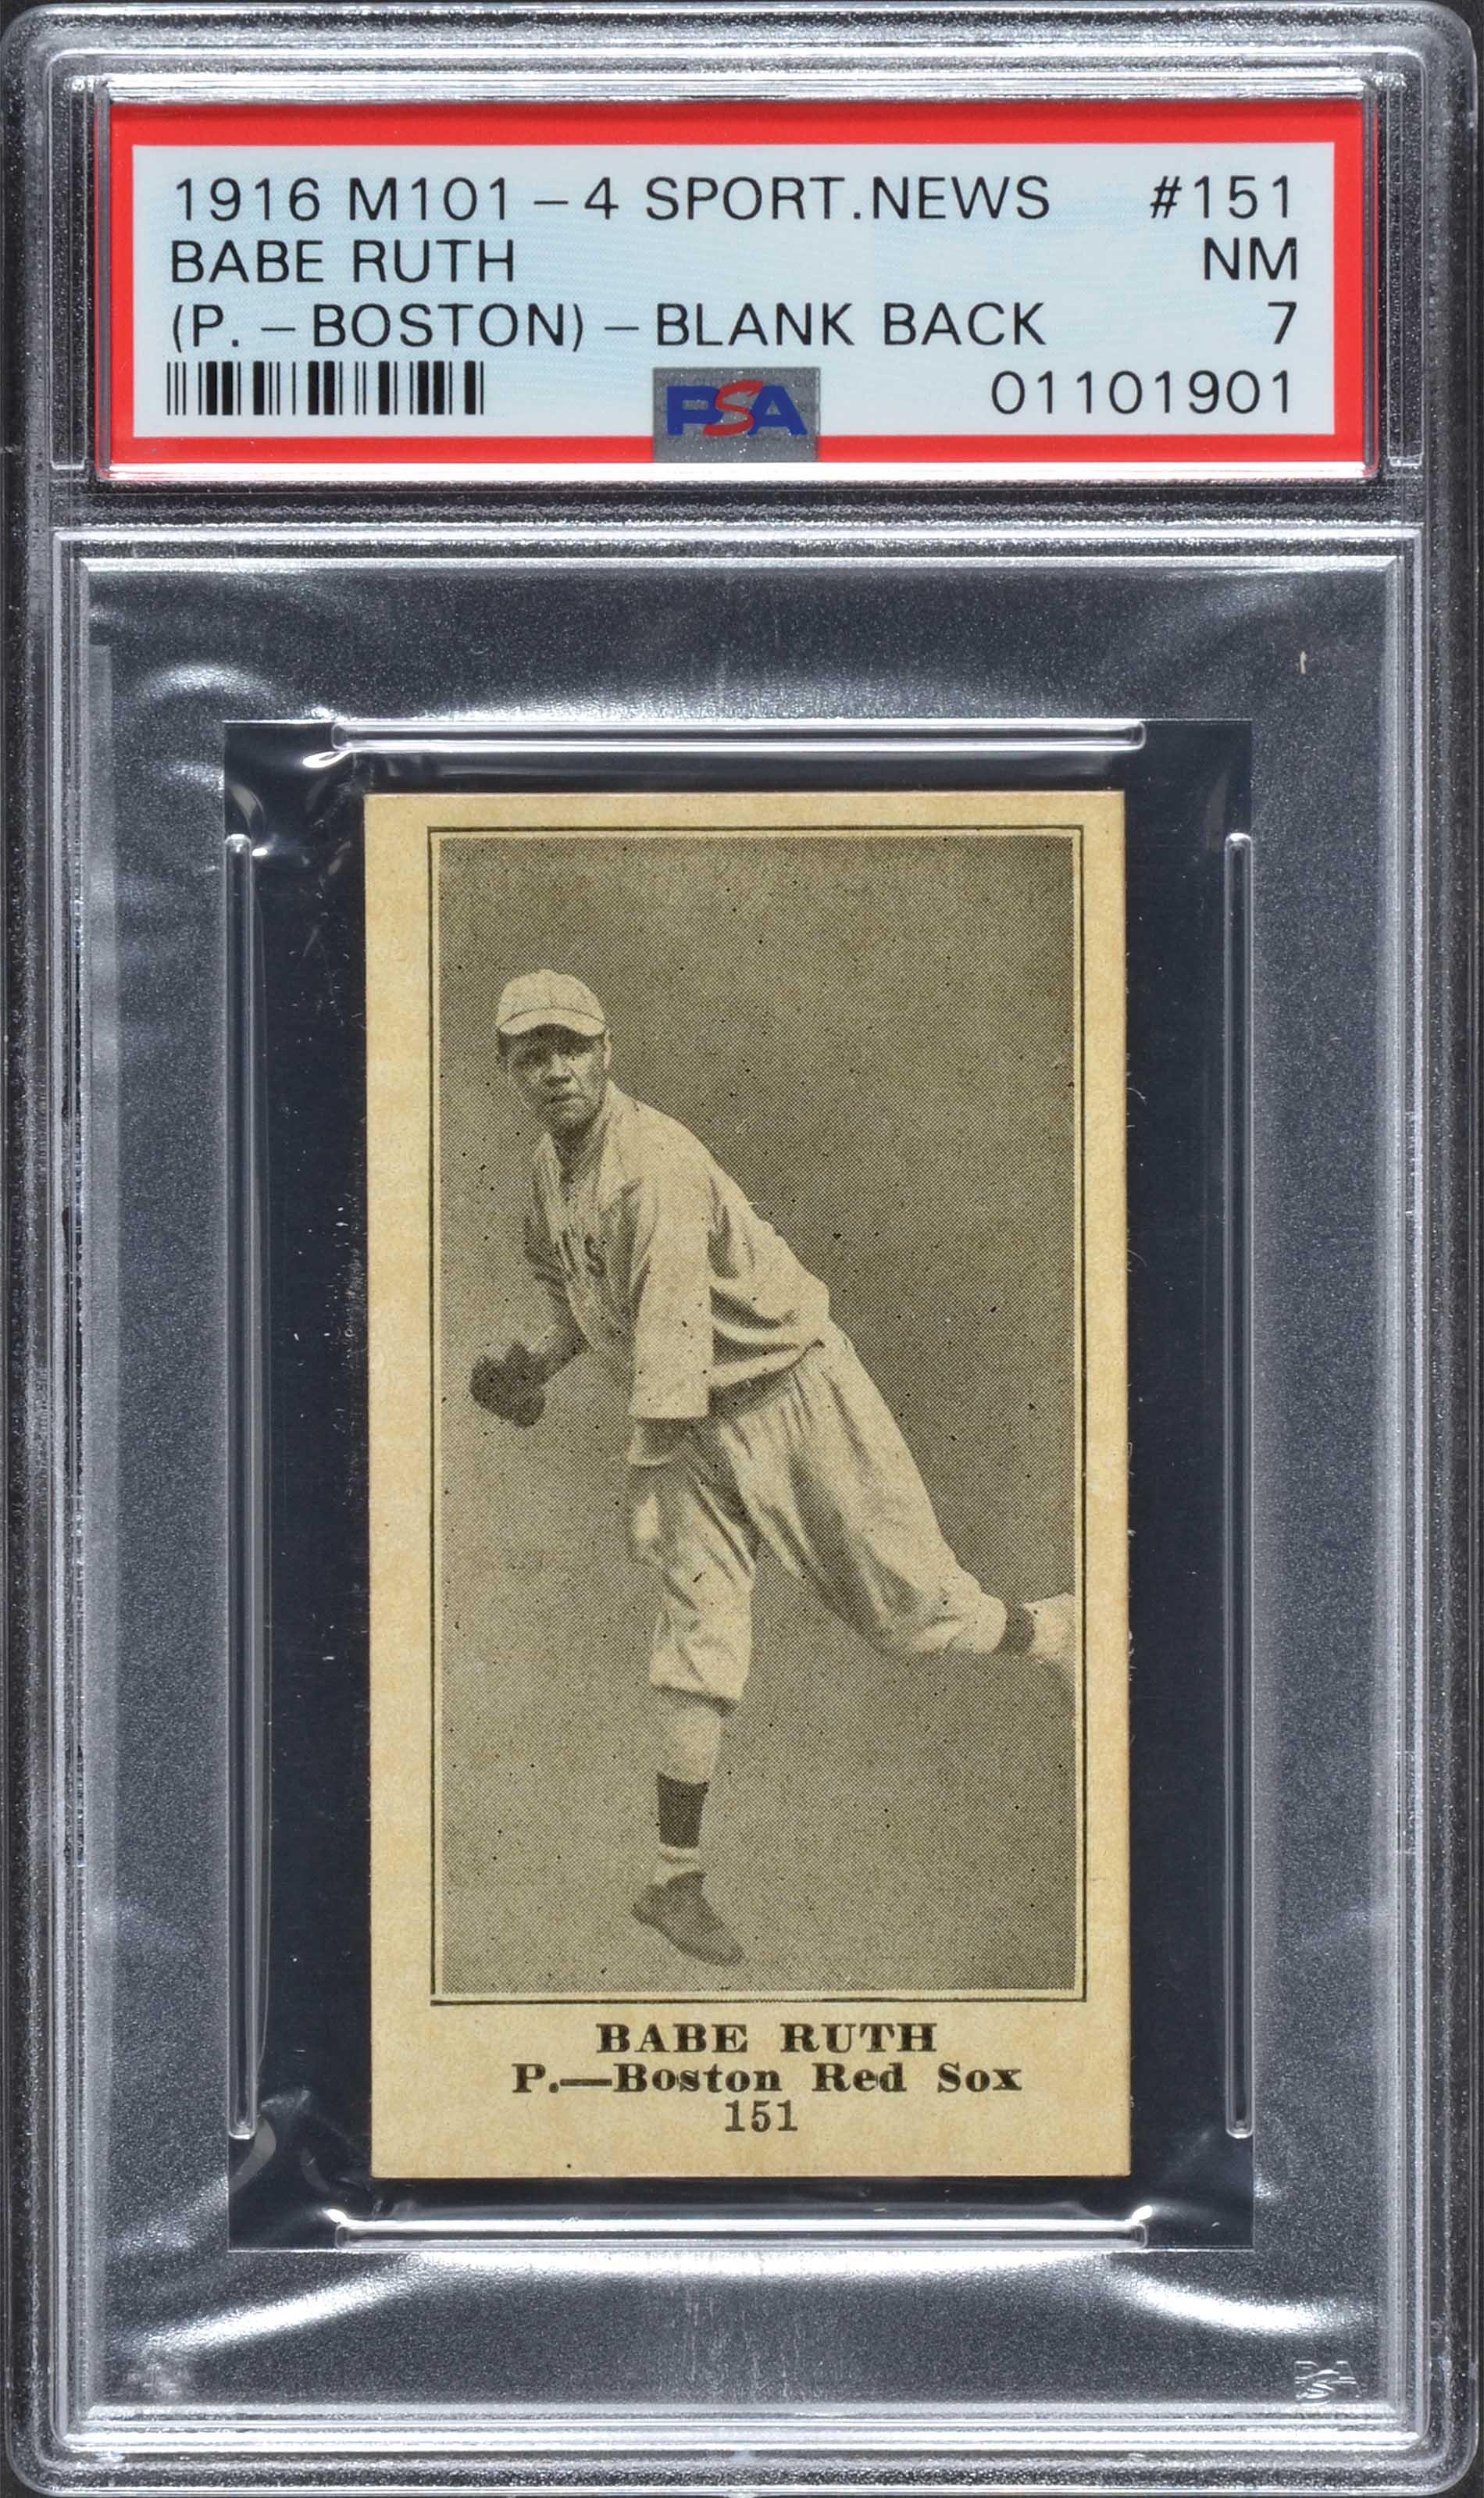 1916 Babe Ruth rookie card PSA 7 near mint